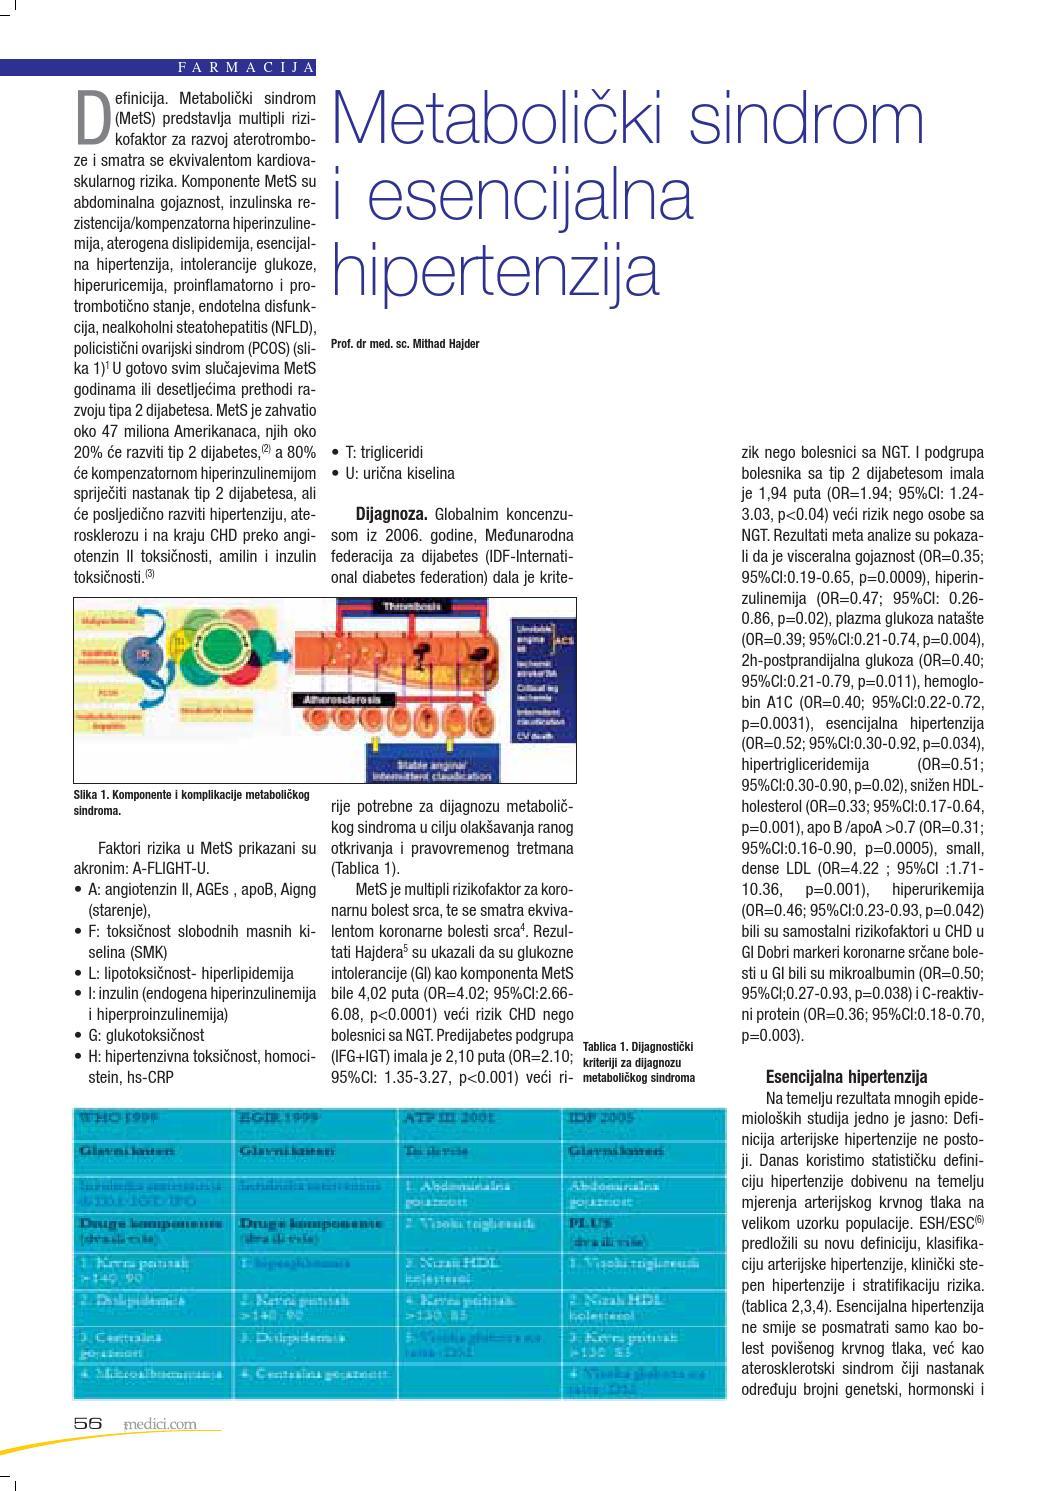 Hipertenzija i metabolički sindrom - Medix